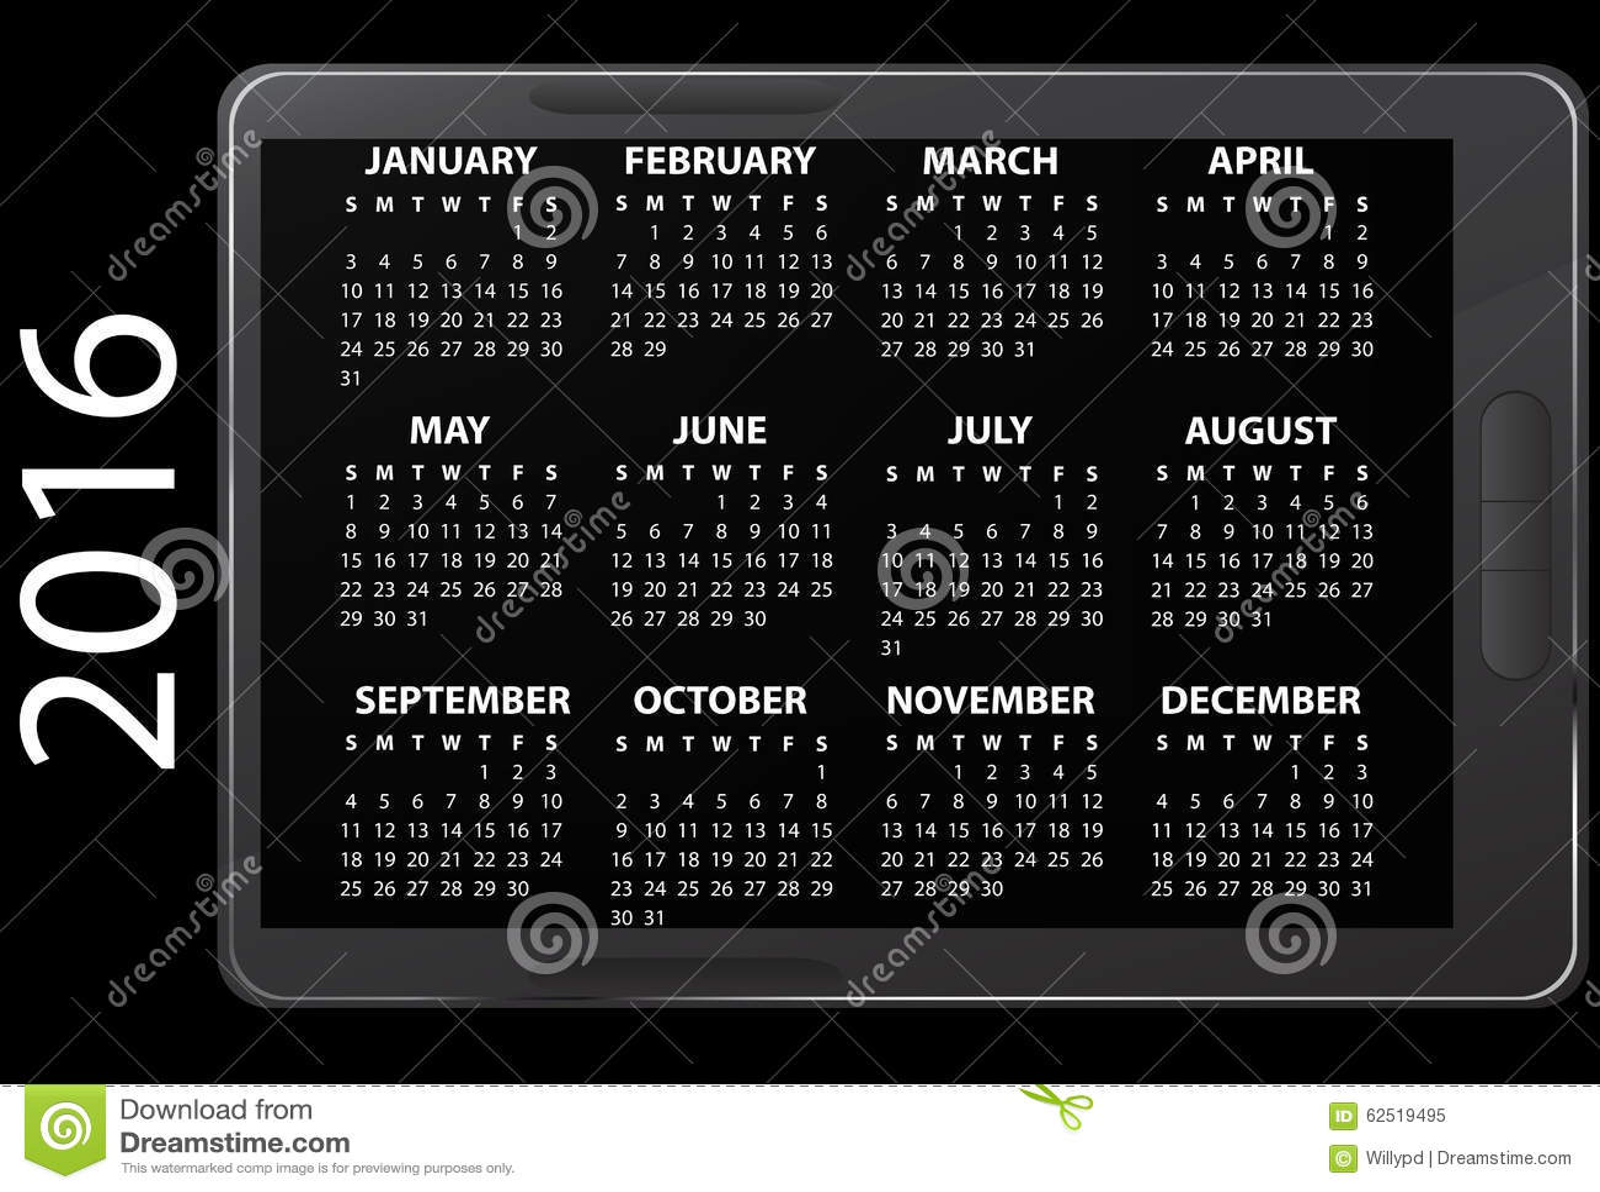 Electronic Calendar Planner : Electronic calendar stock image of planning